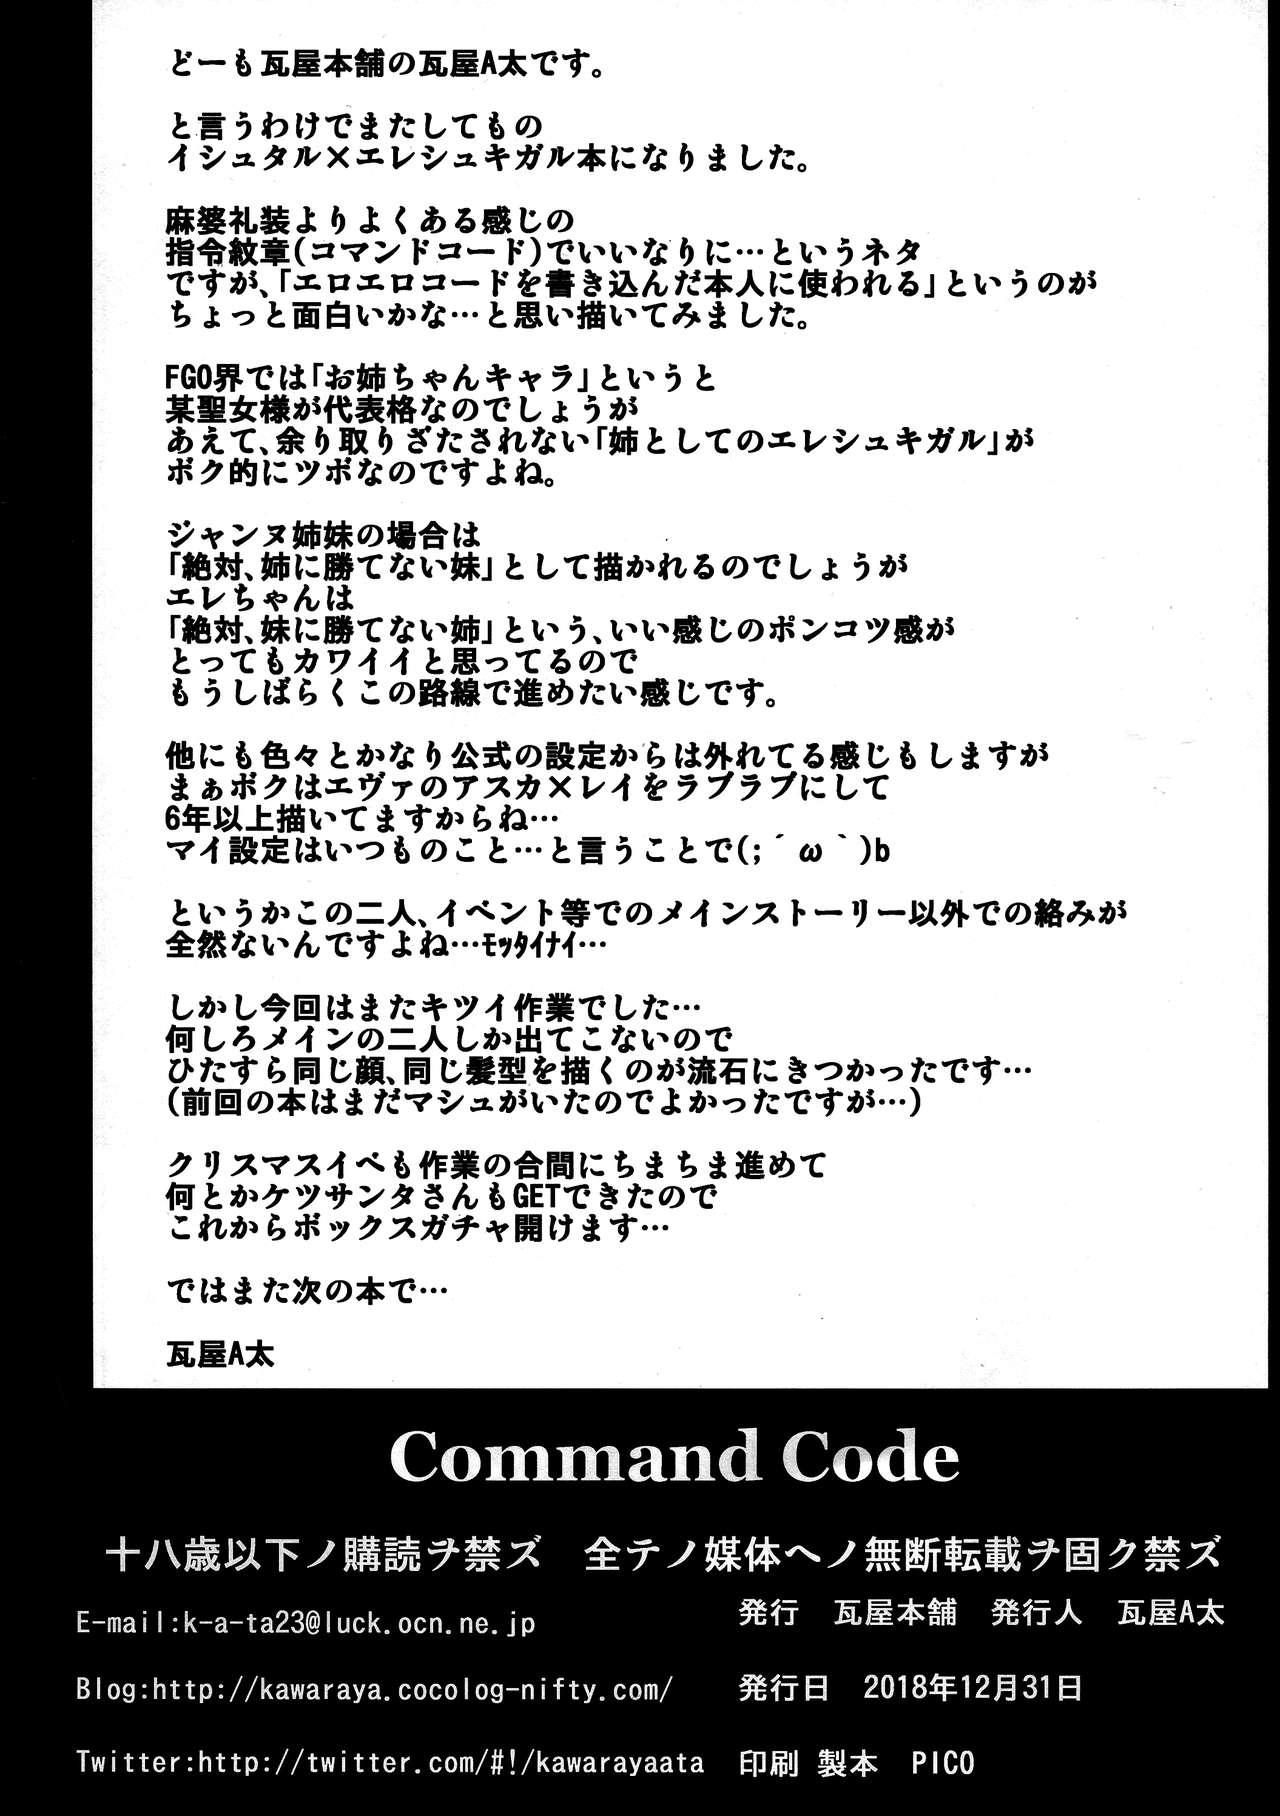 COMMAND CODE 42